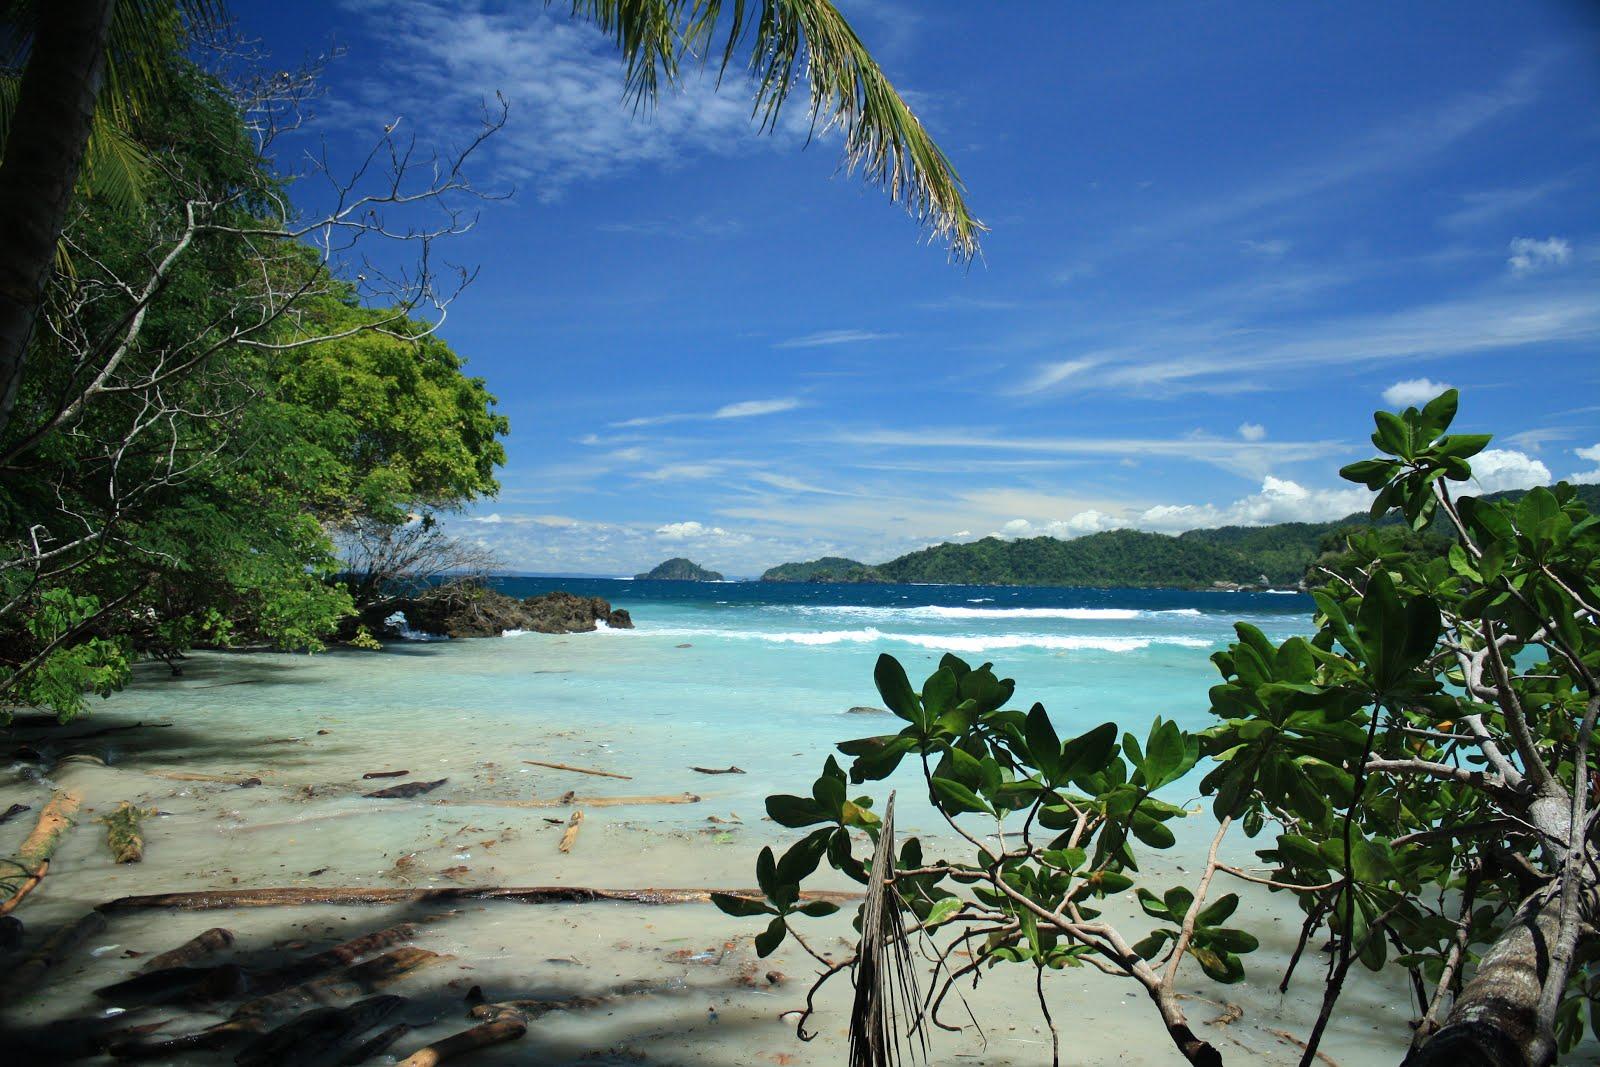 Daftar Wisata Pantai Di Provinsi Lampung - Wisata Keren